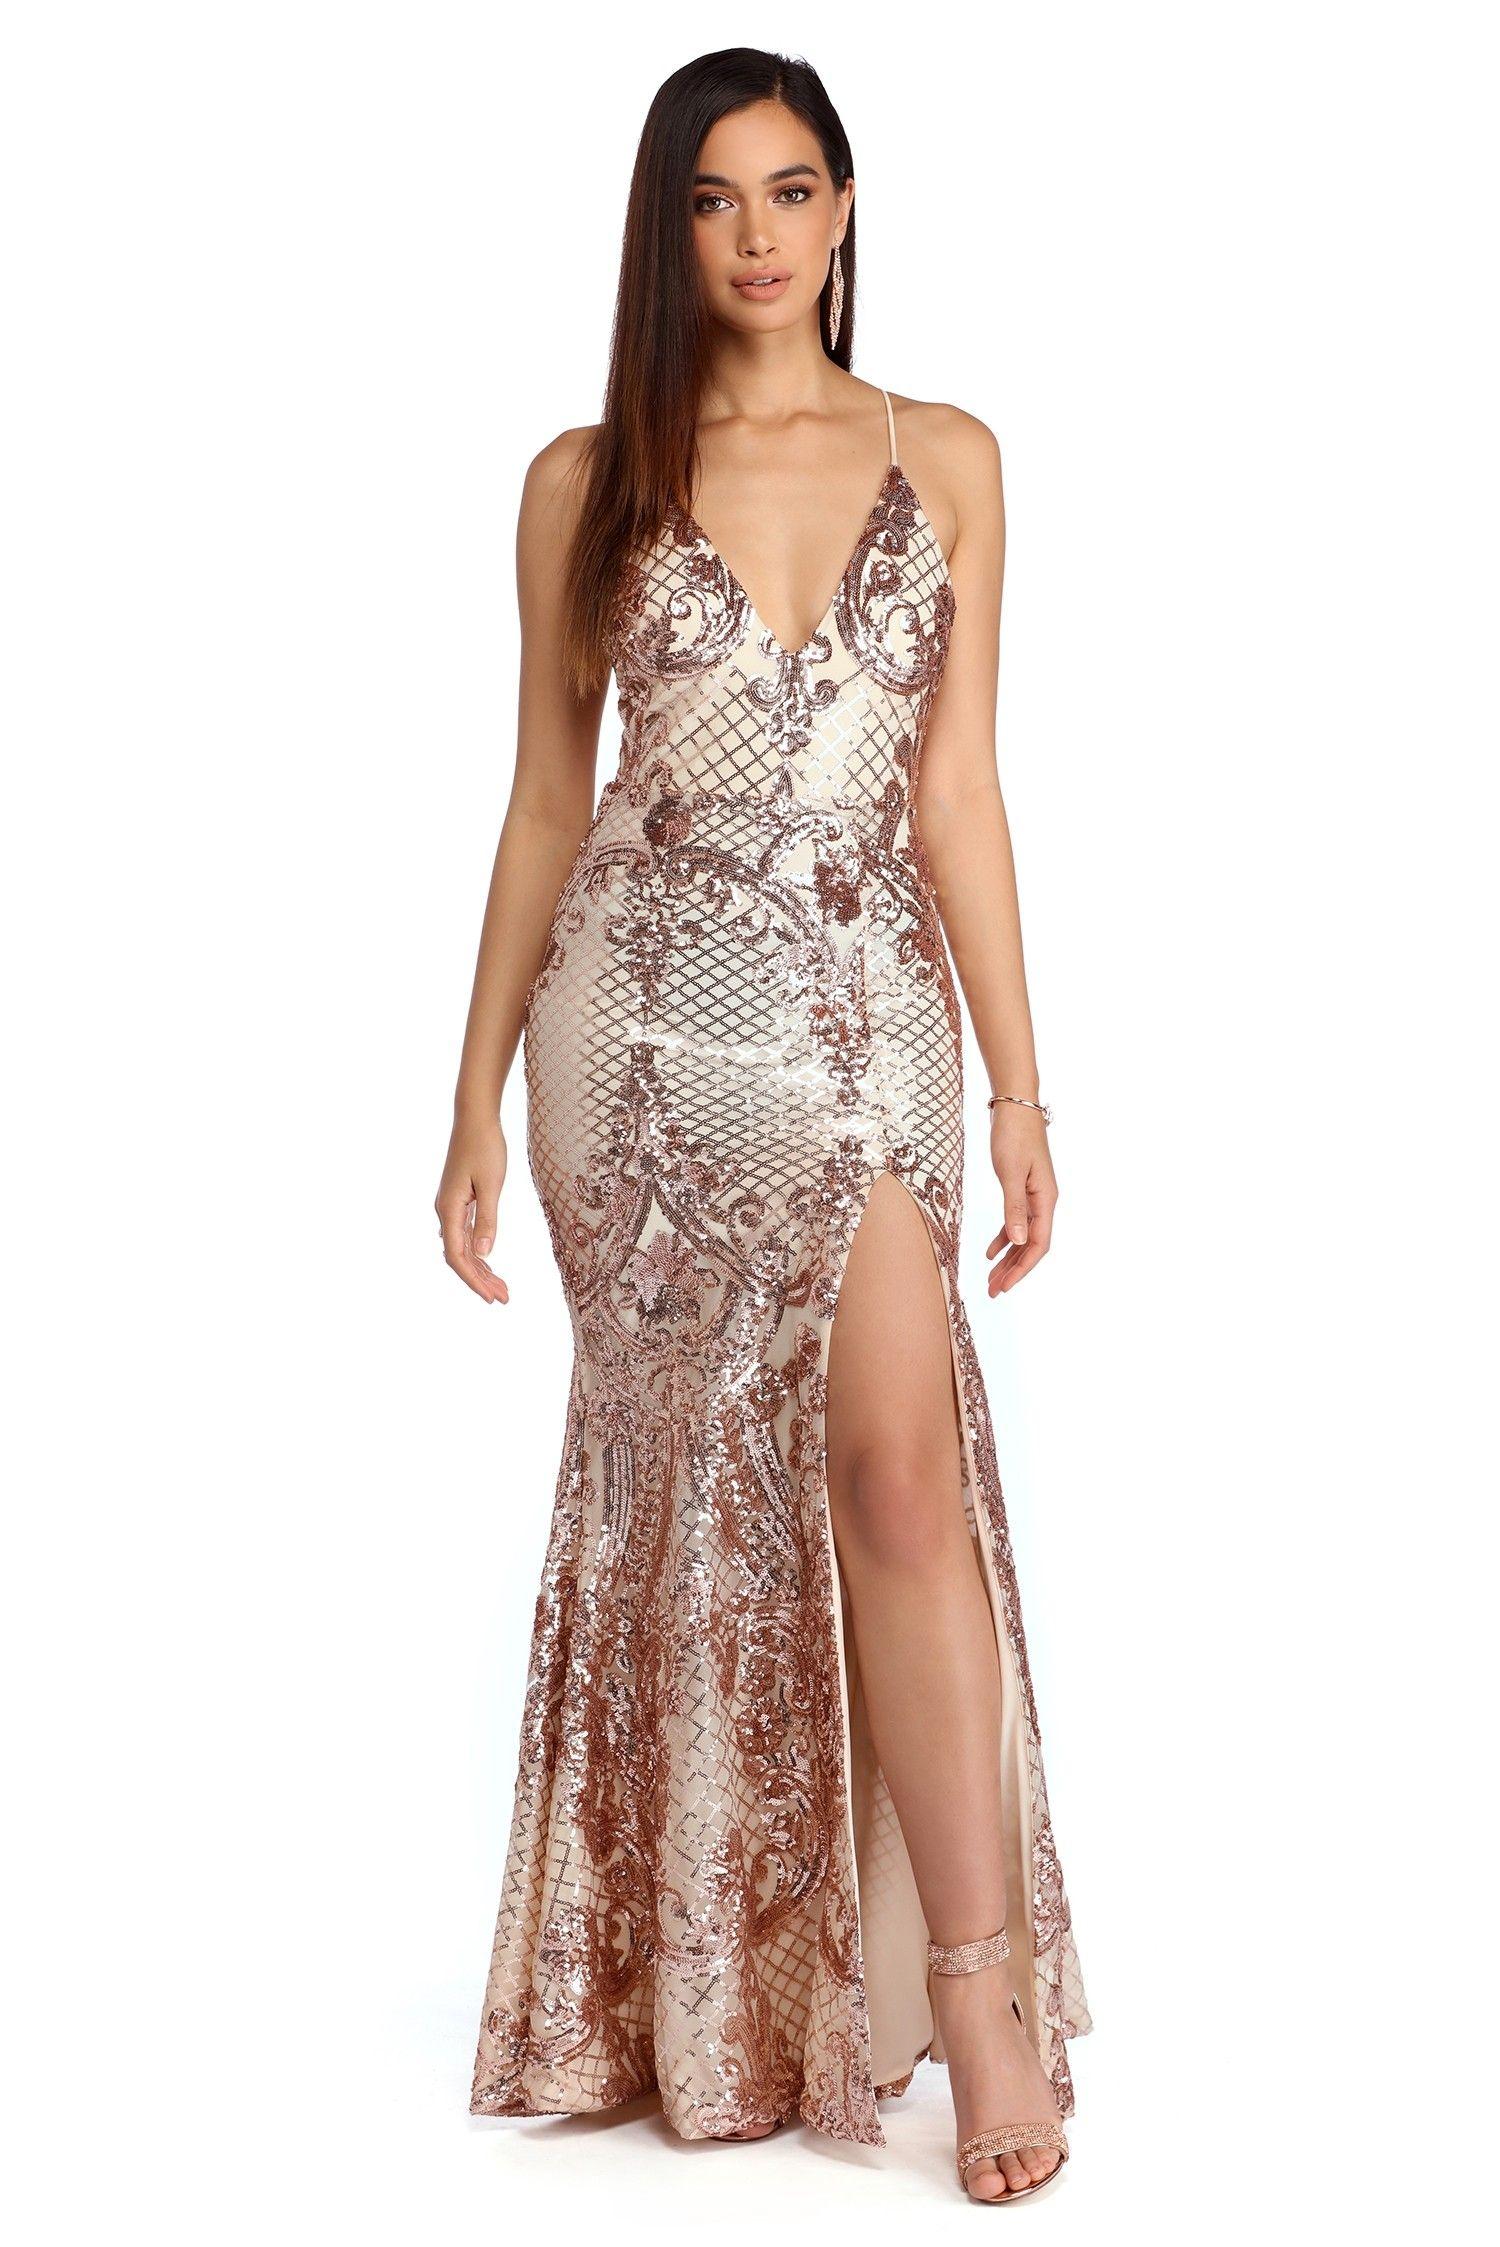 b184c6acab2 FINAL SALE -Imani Rose Gold Sequin Dress in 2019